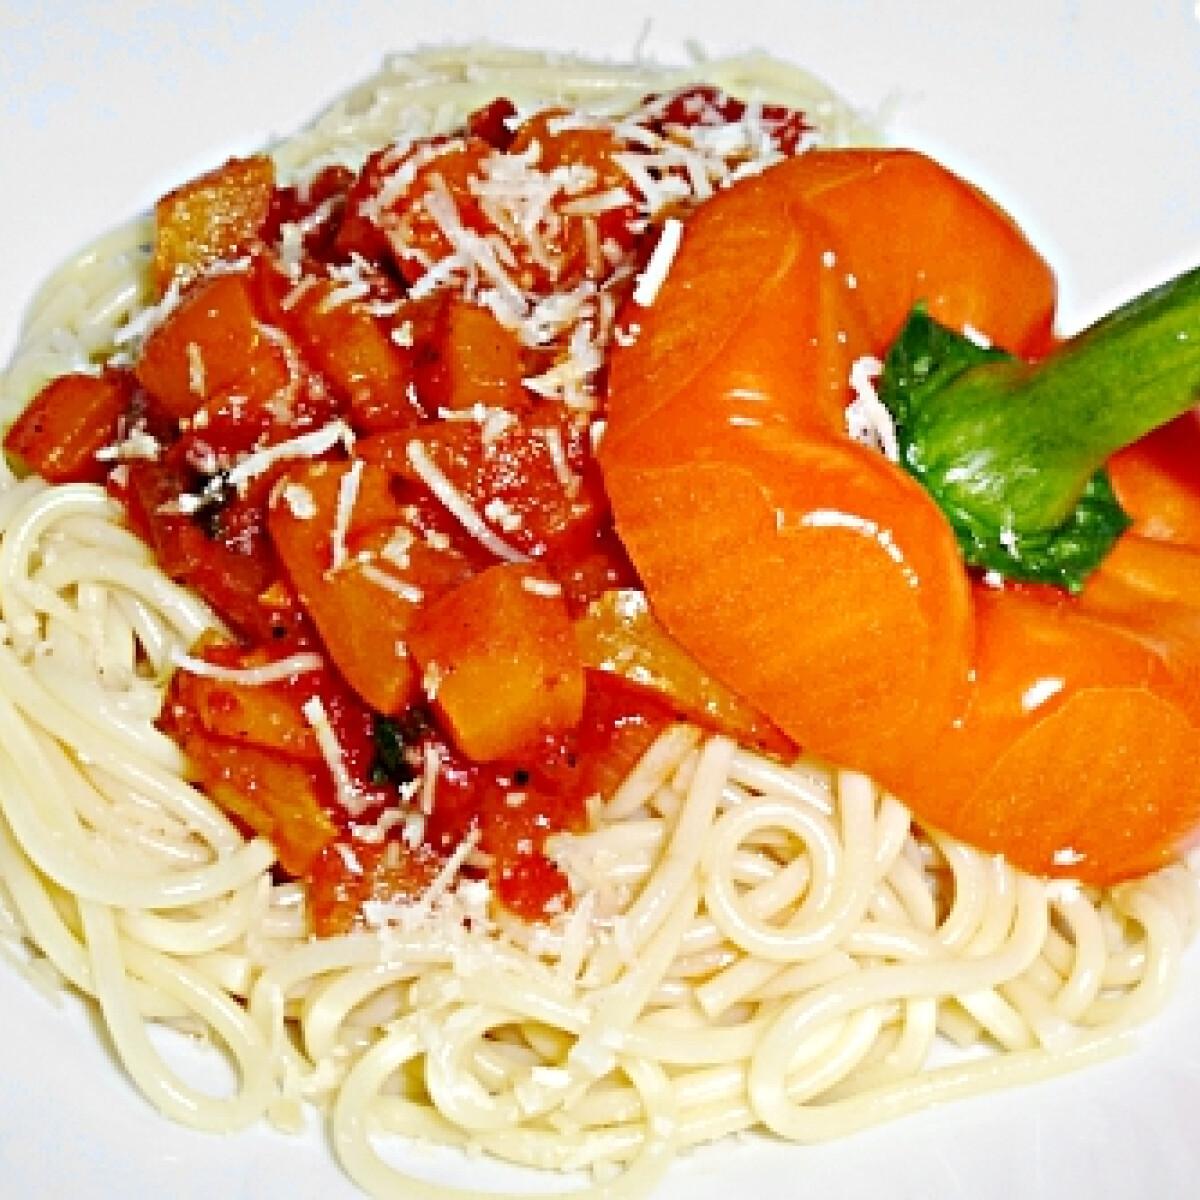 Paprikás-paradicsomos spagetti Mártitól